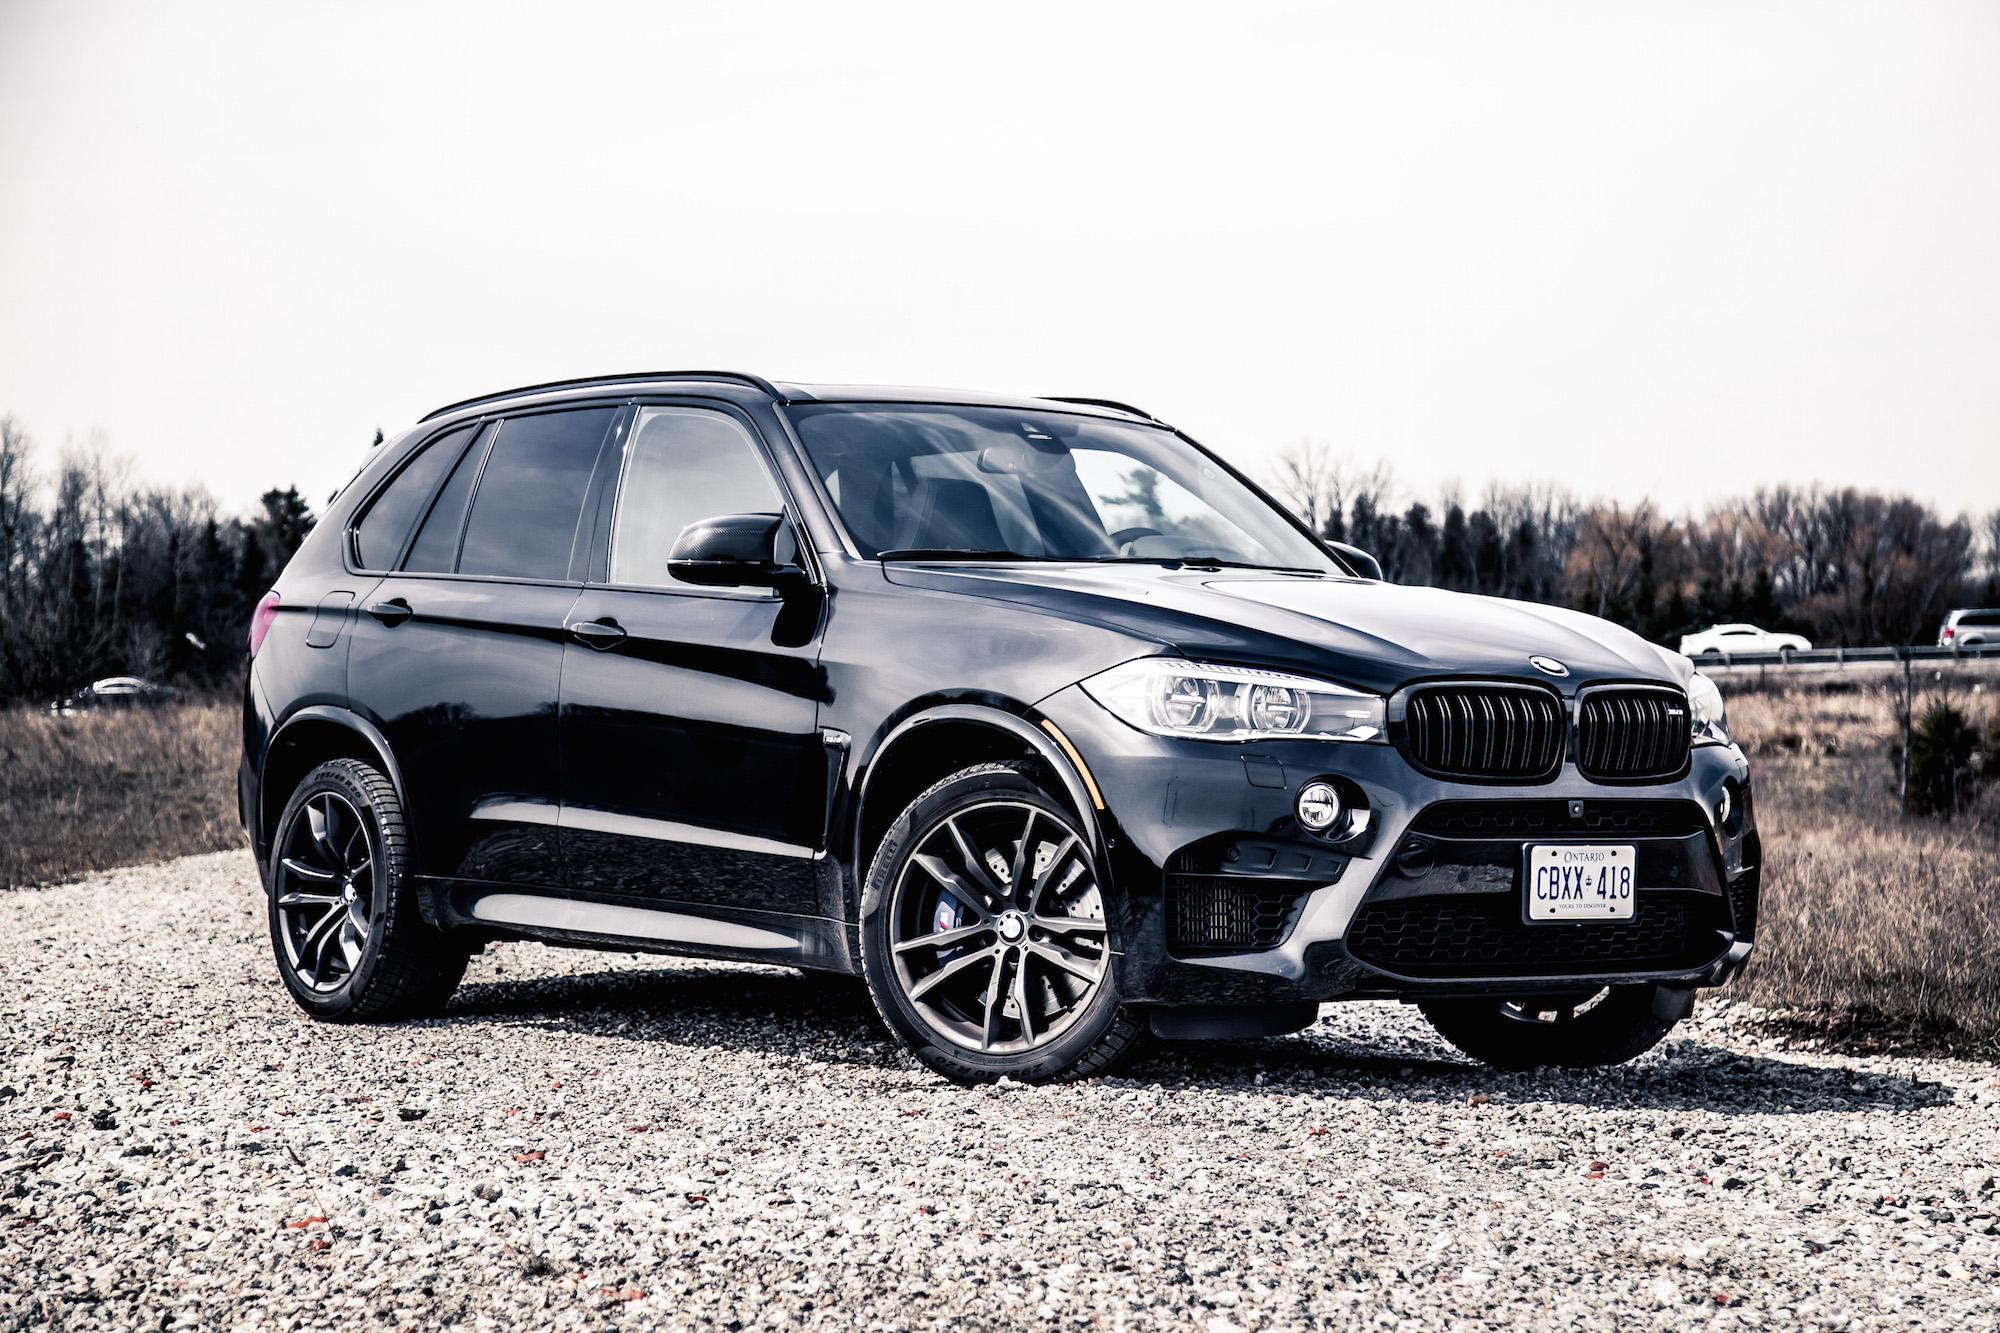 Review 2018 Bmw X5 M Black Fire Edition Car